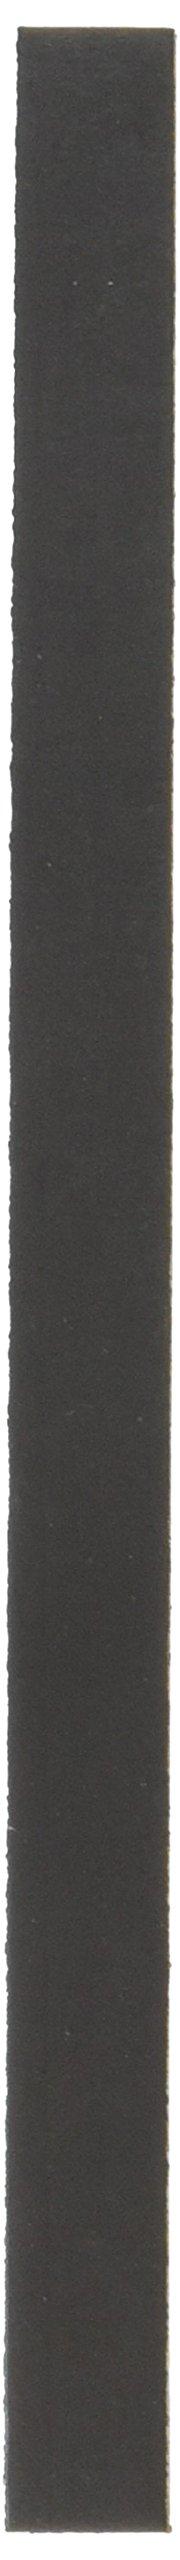 5-Pk Dynabrade 11026 1/2-Inch Width by 7-Inch Length DynaPad Hard Platen Pad by Dynabrade